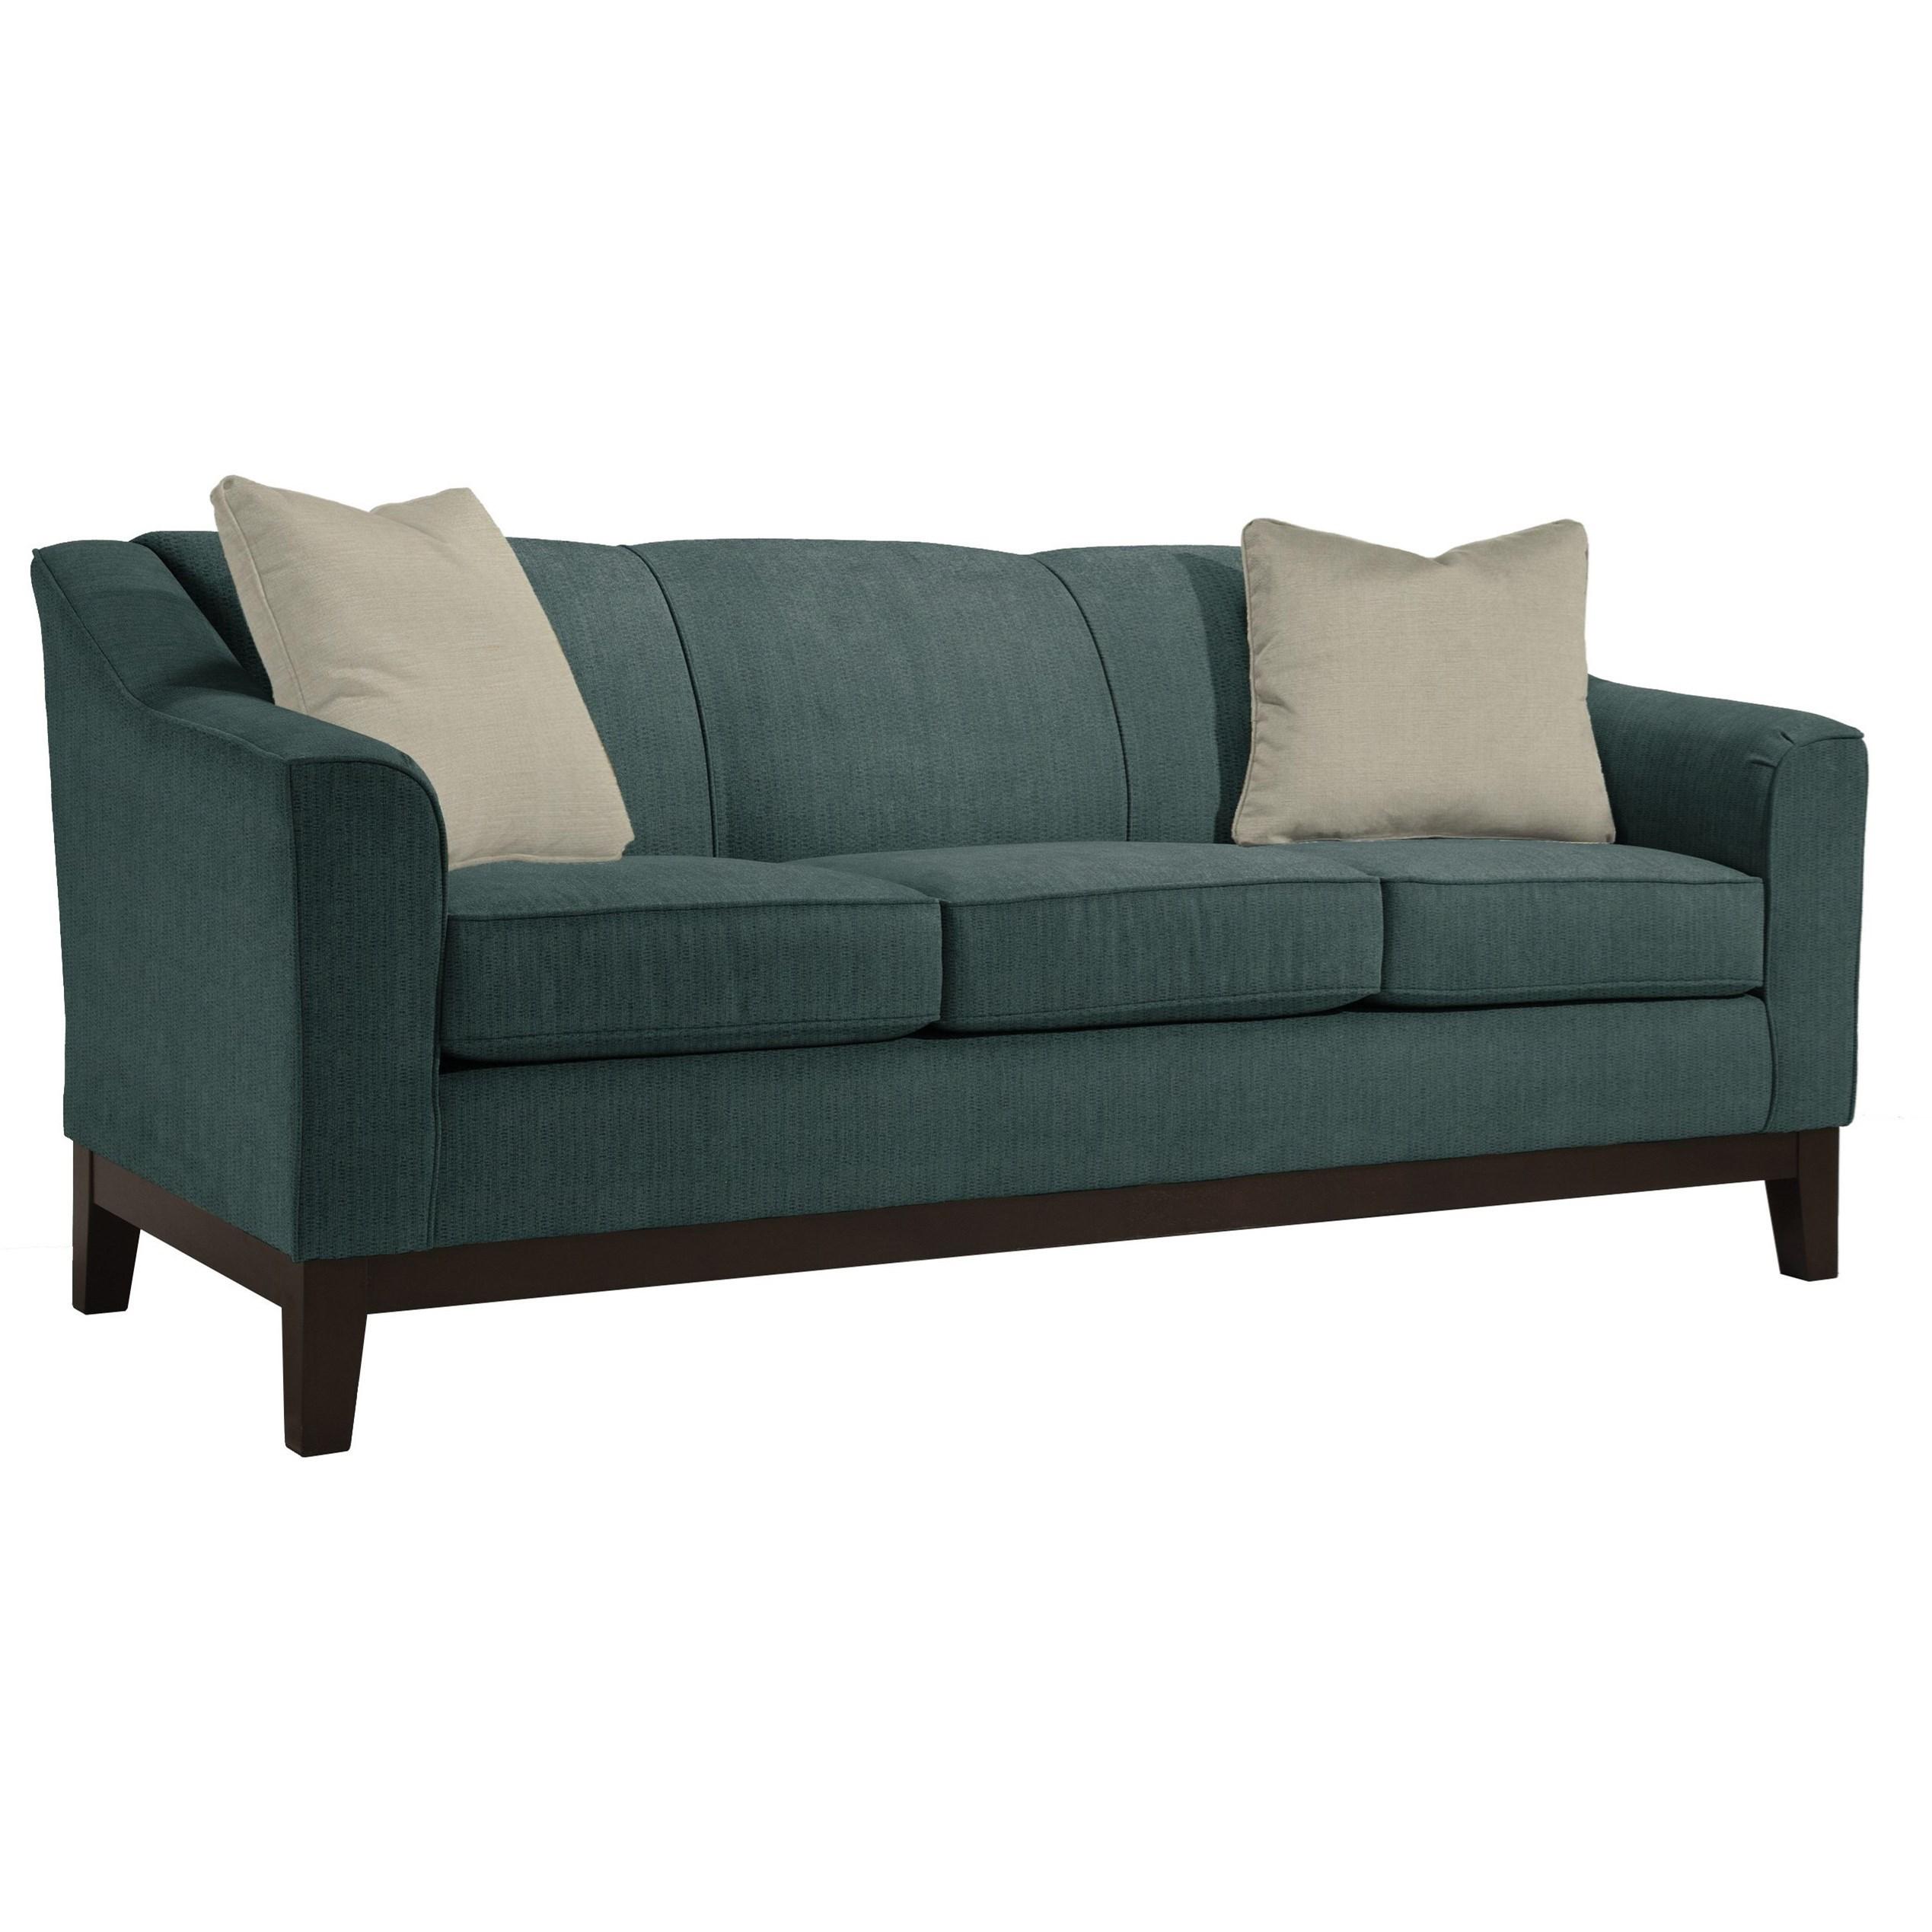 Best Home Furnishings Emeline Customizable Sofa - Item Number: 206338137-23652